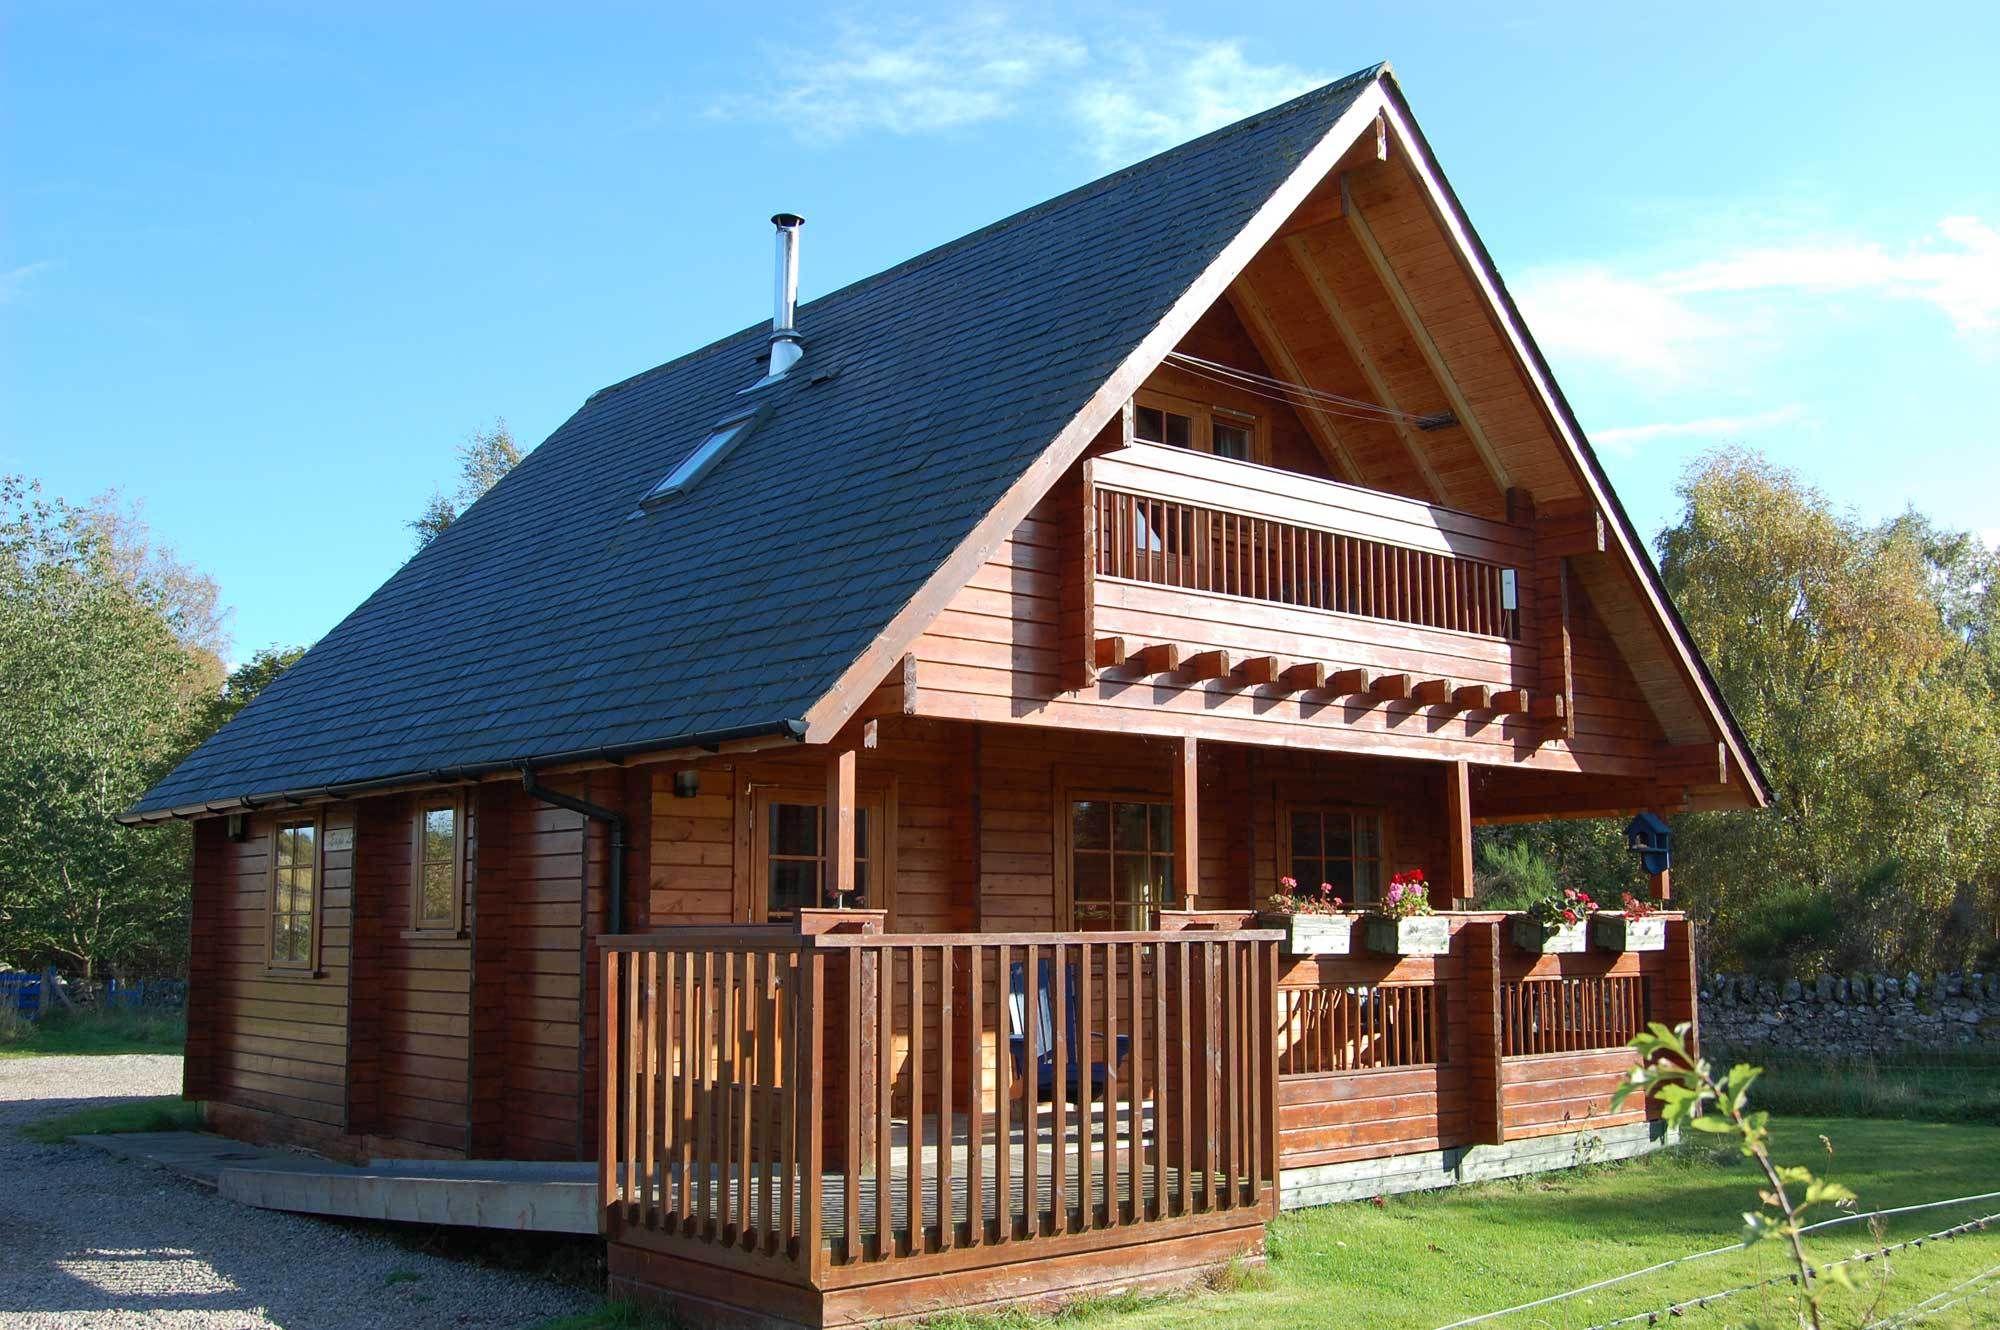 Big Sky Lodges